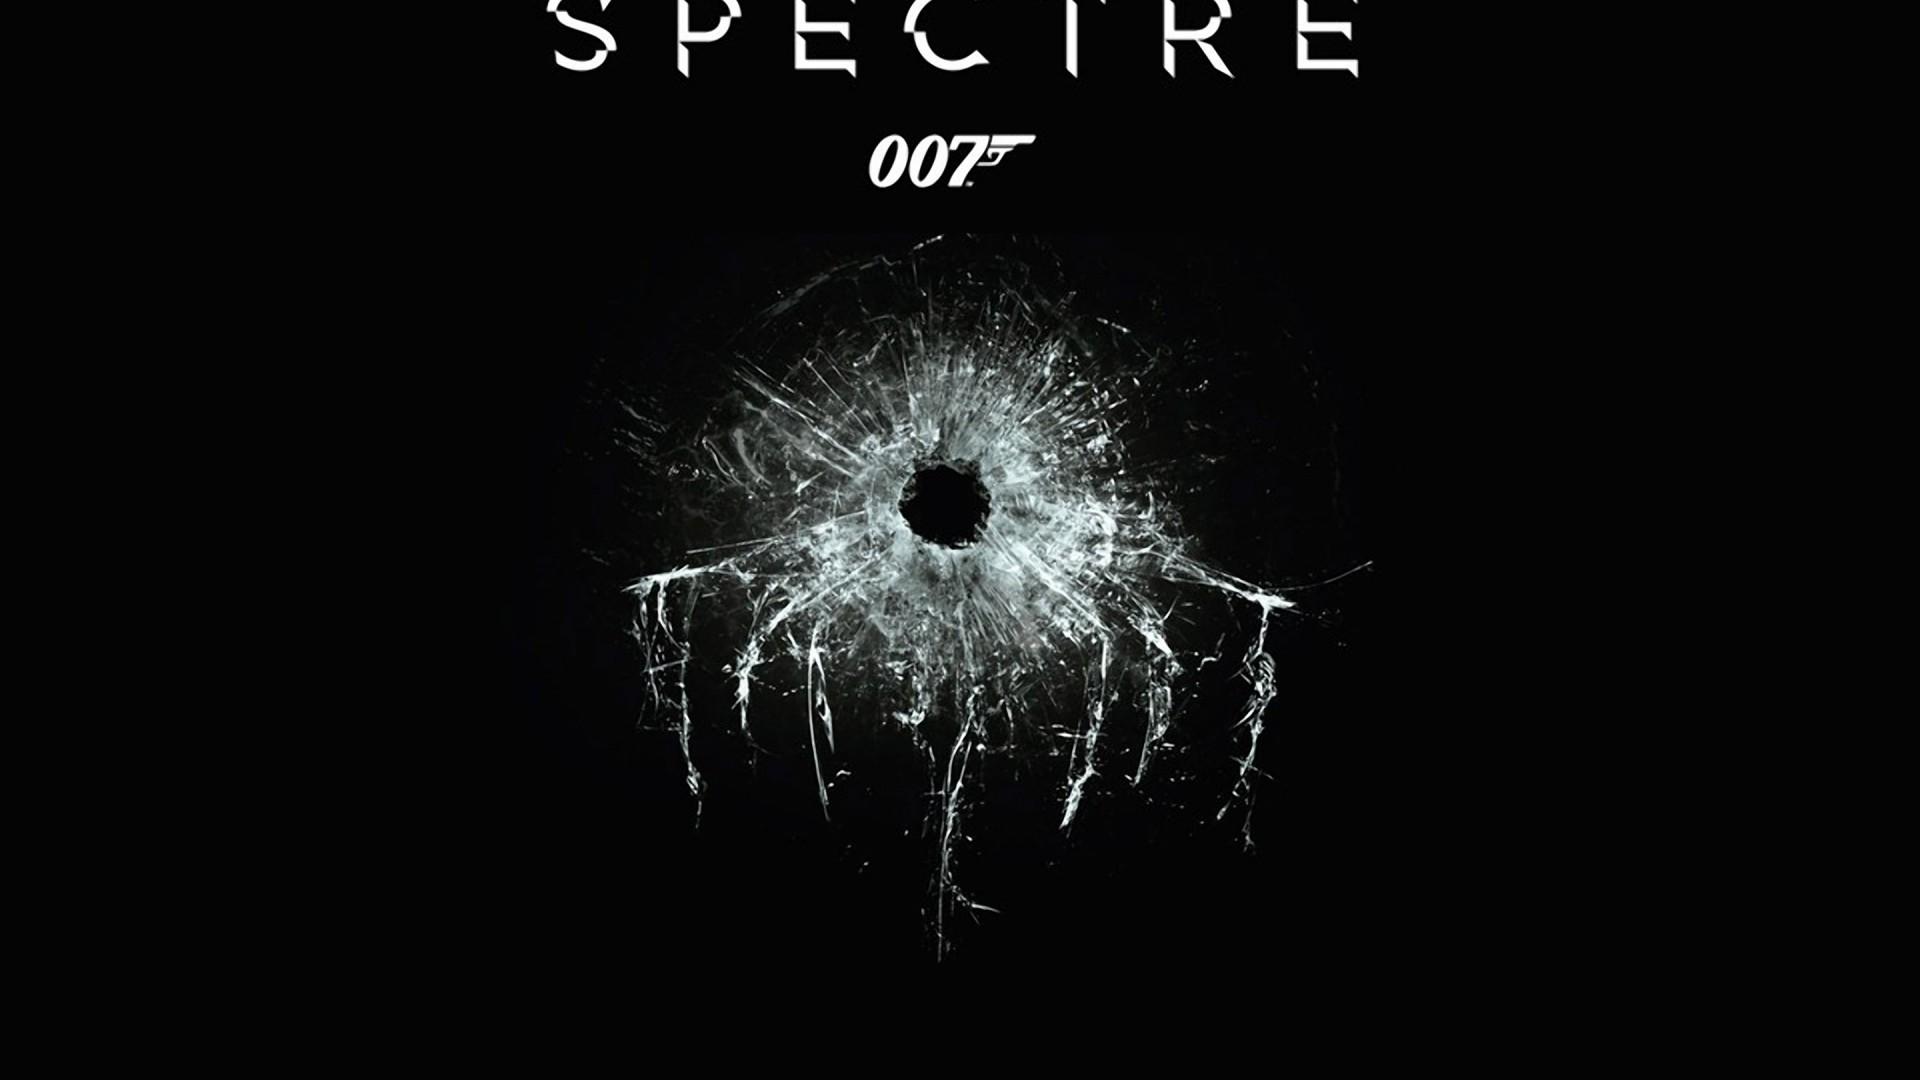 Spectre James Bond 007 Movie hd 1080p wallpaper   HD iPad wallpaper 1920x1080